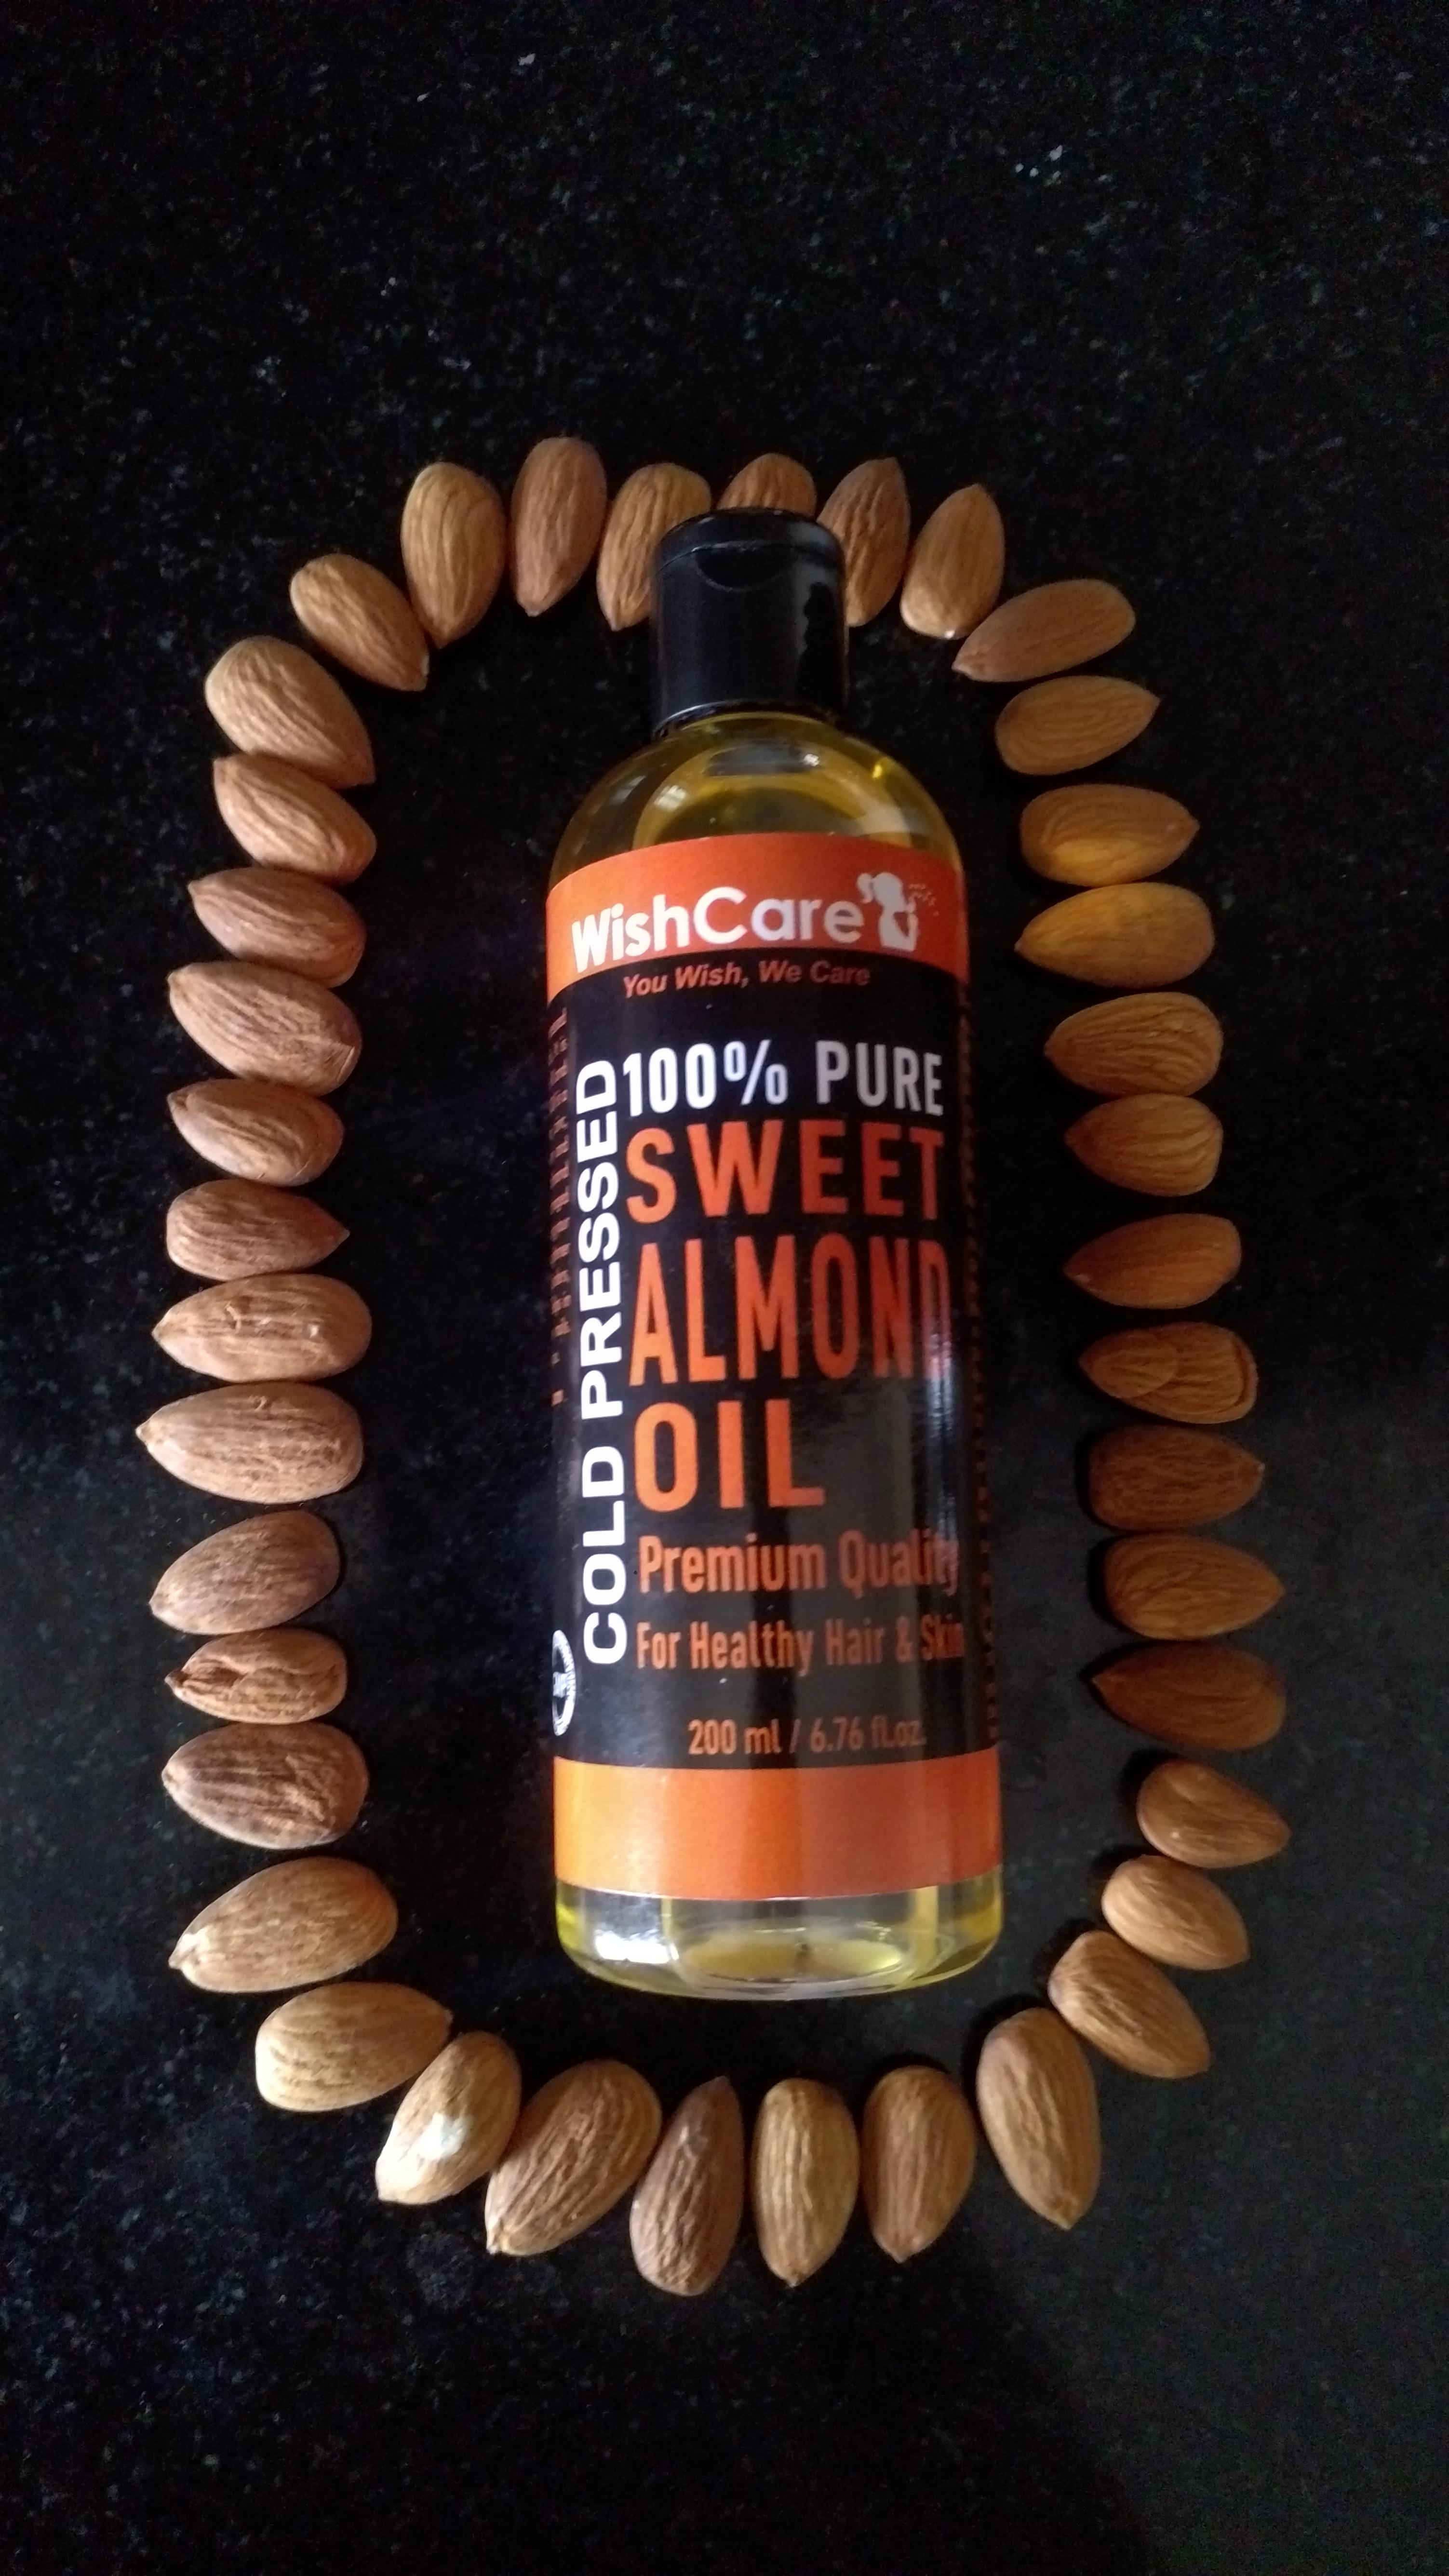 WishCare Pure Cold Pressed Sweet Almond Oil-Nice hair oil …-By sreekala